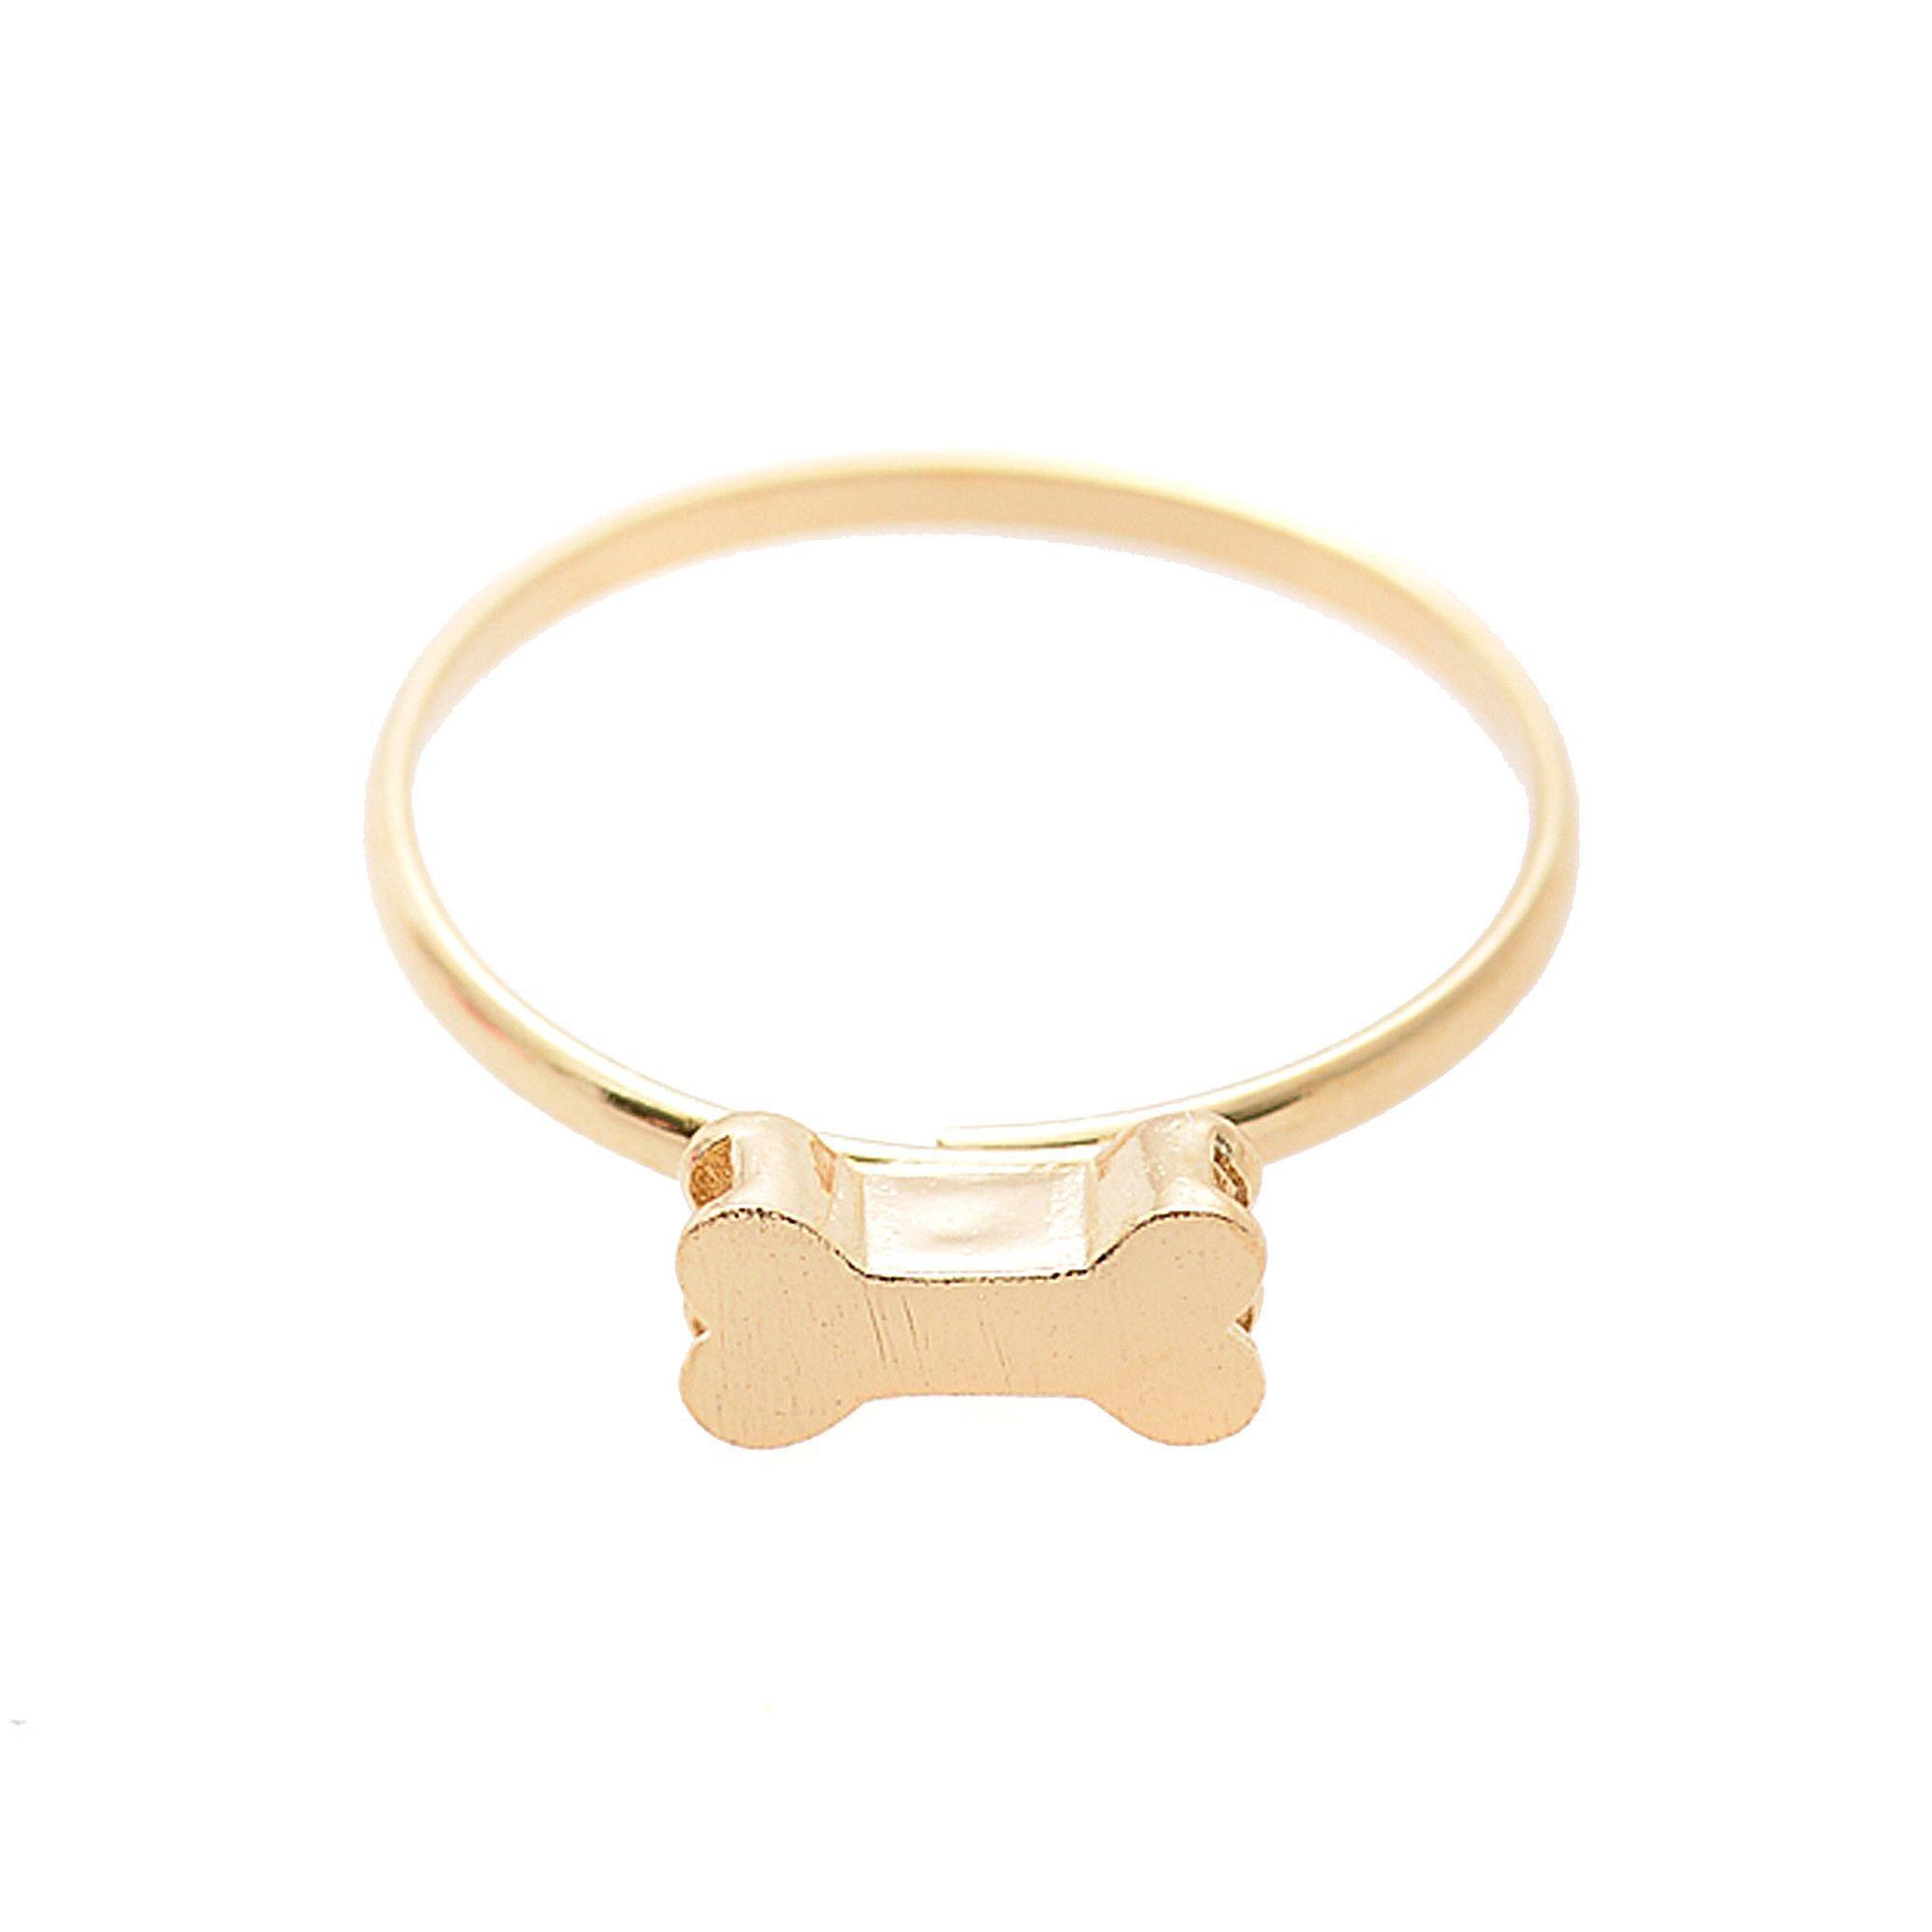 Spinningdaisy Handcrafted Brushed Metal Kitsch Dog Bone Ring